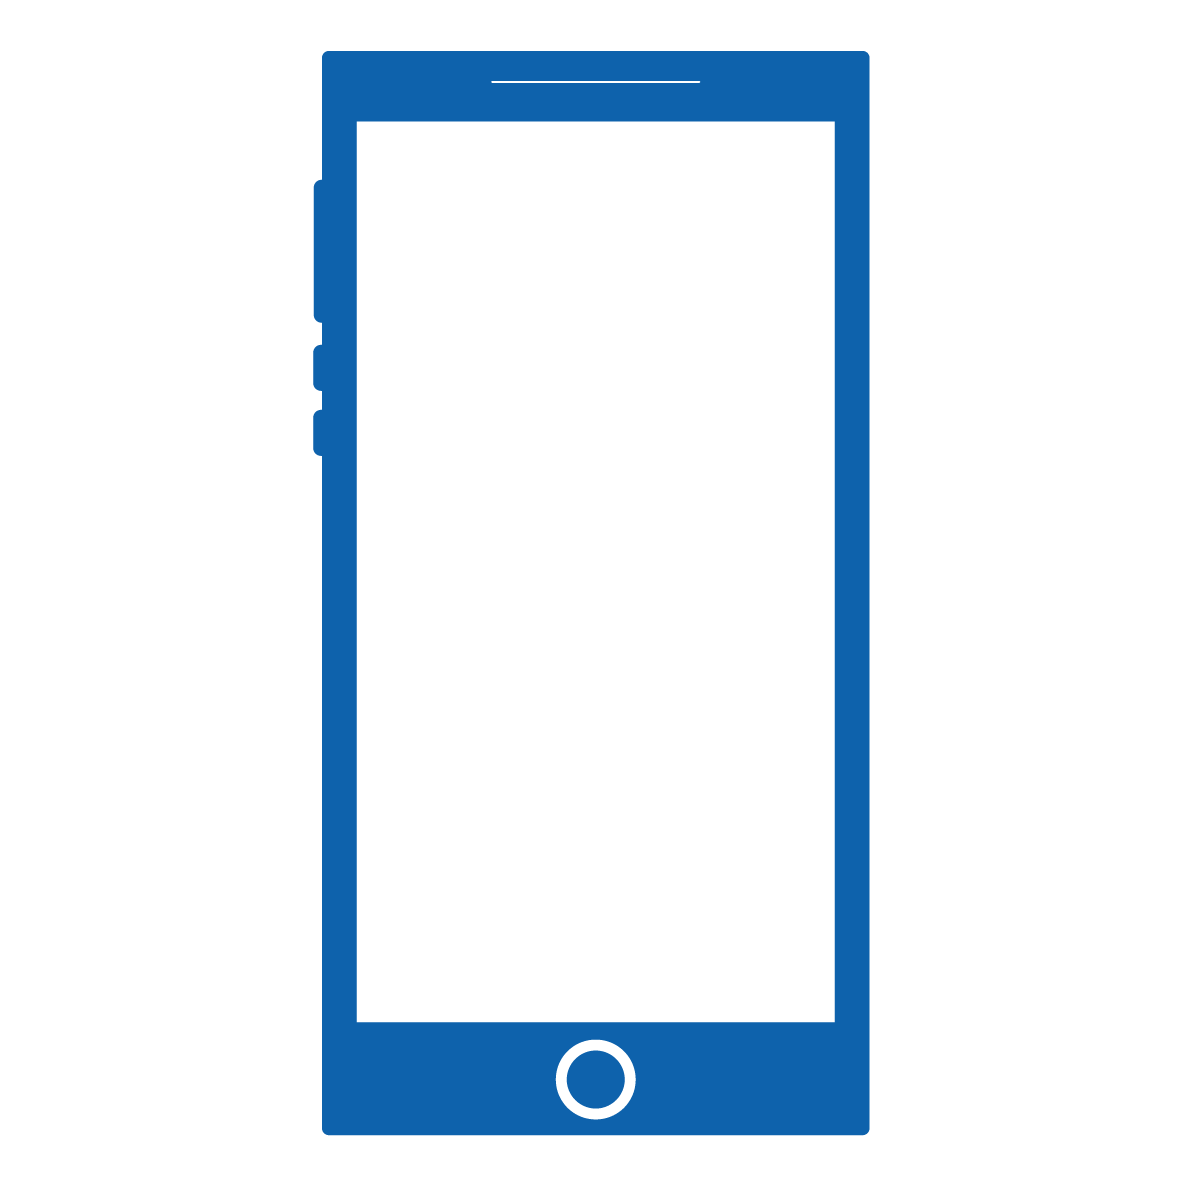 Top 3 Moodle Features - Moodle Mobile app